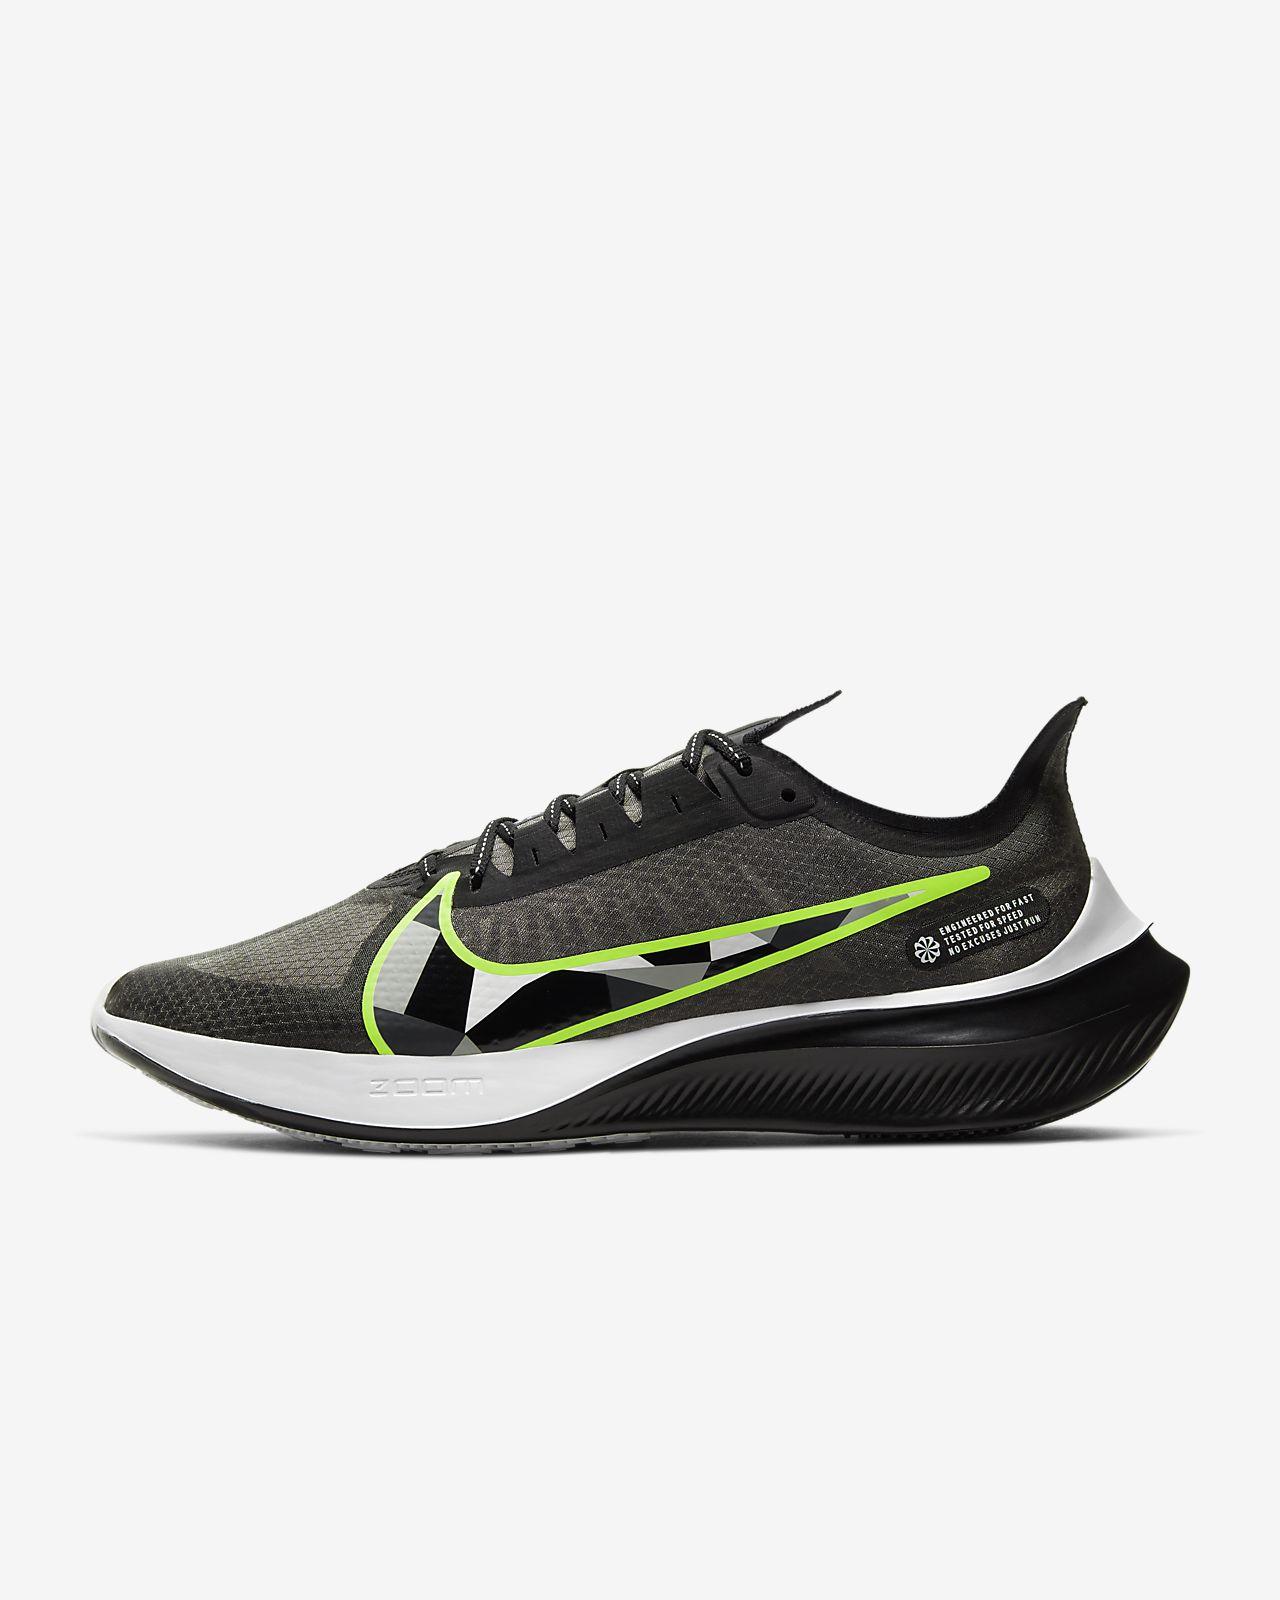 2nike runner hombre zapatillas